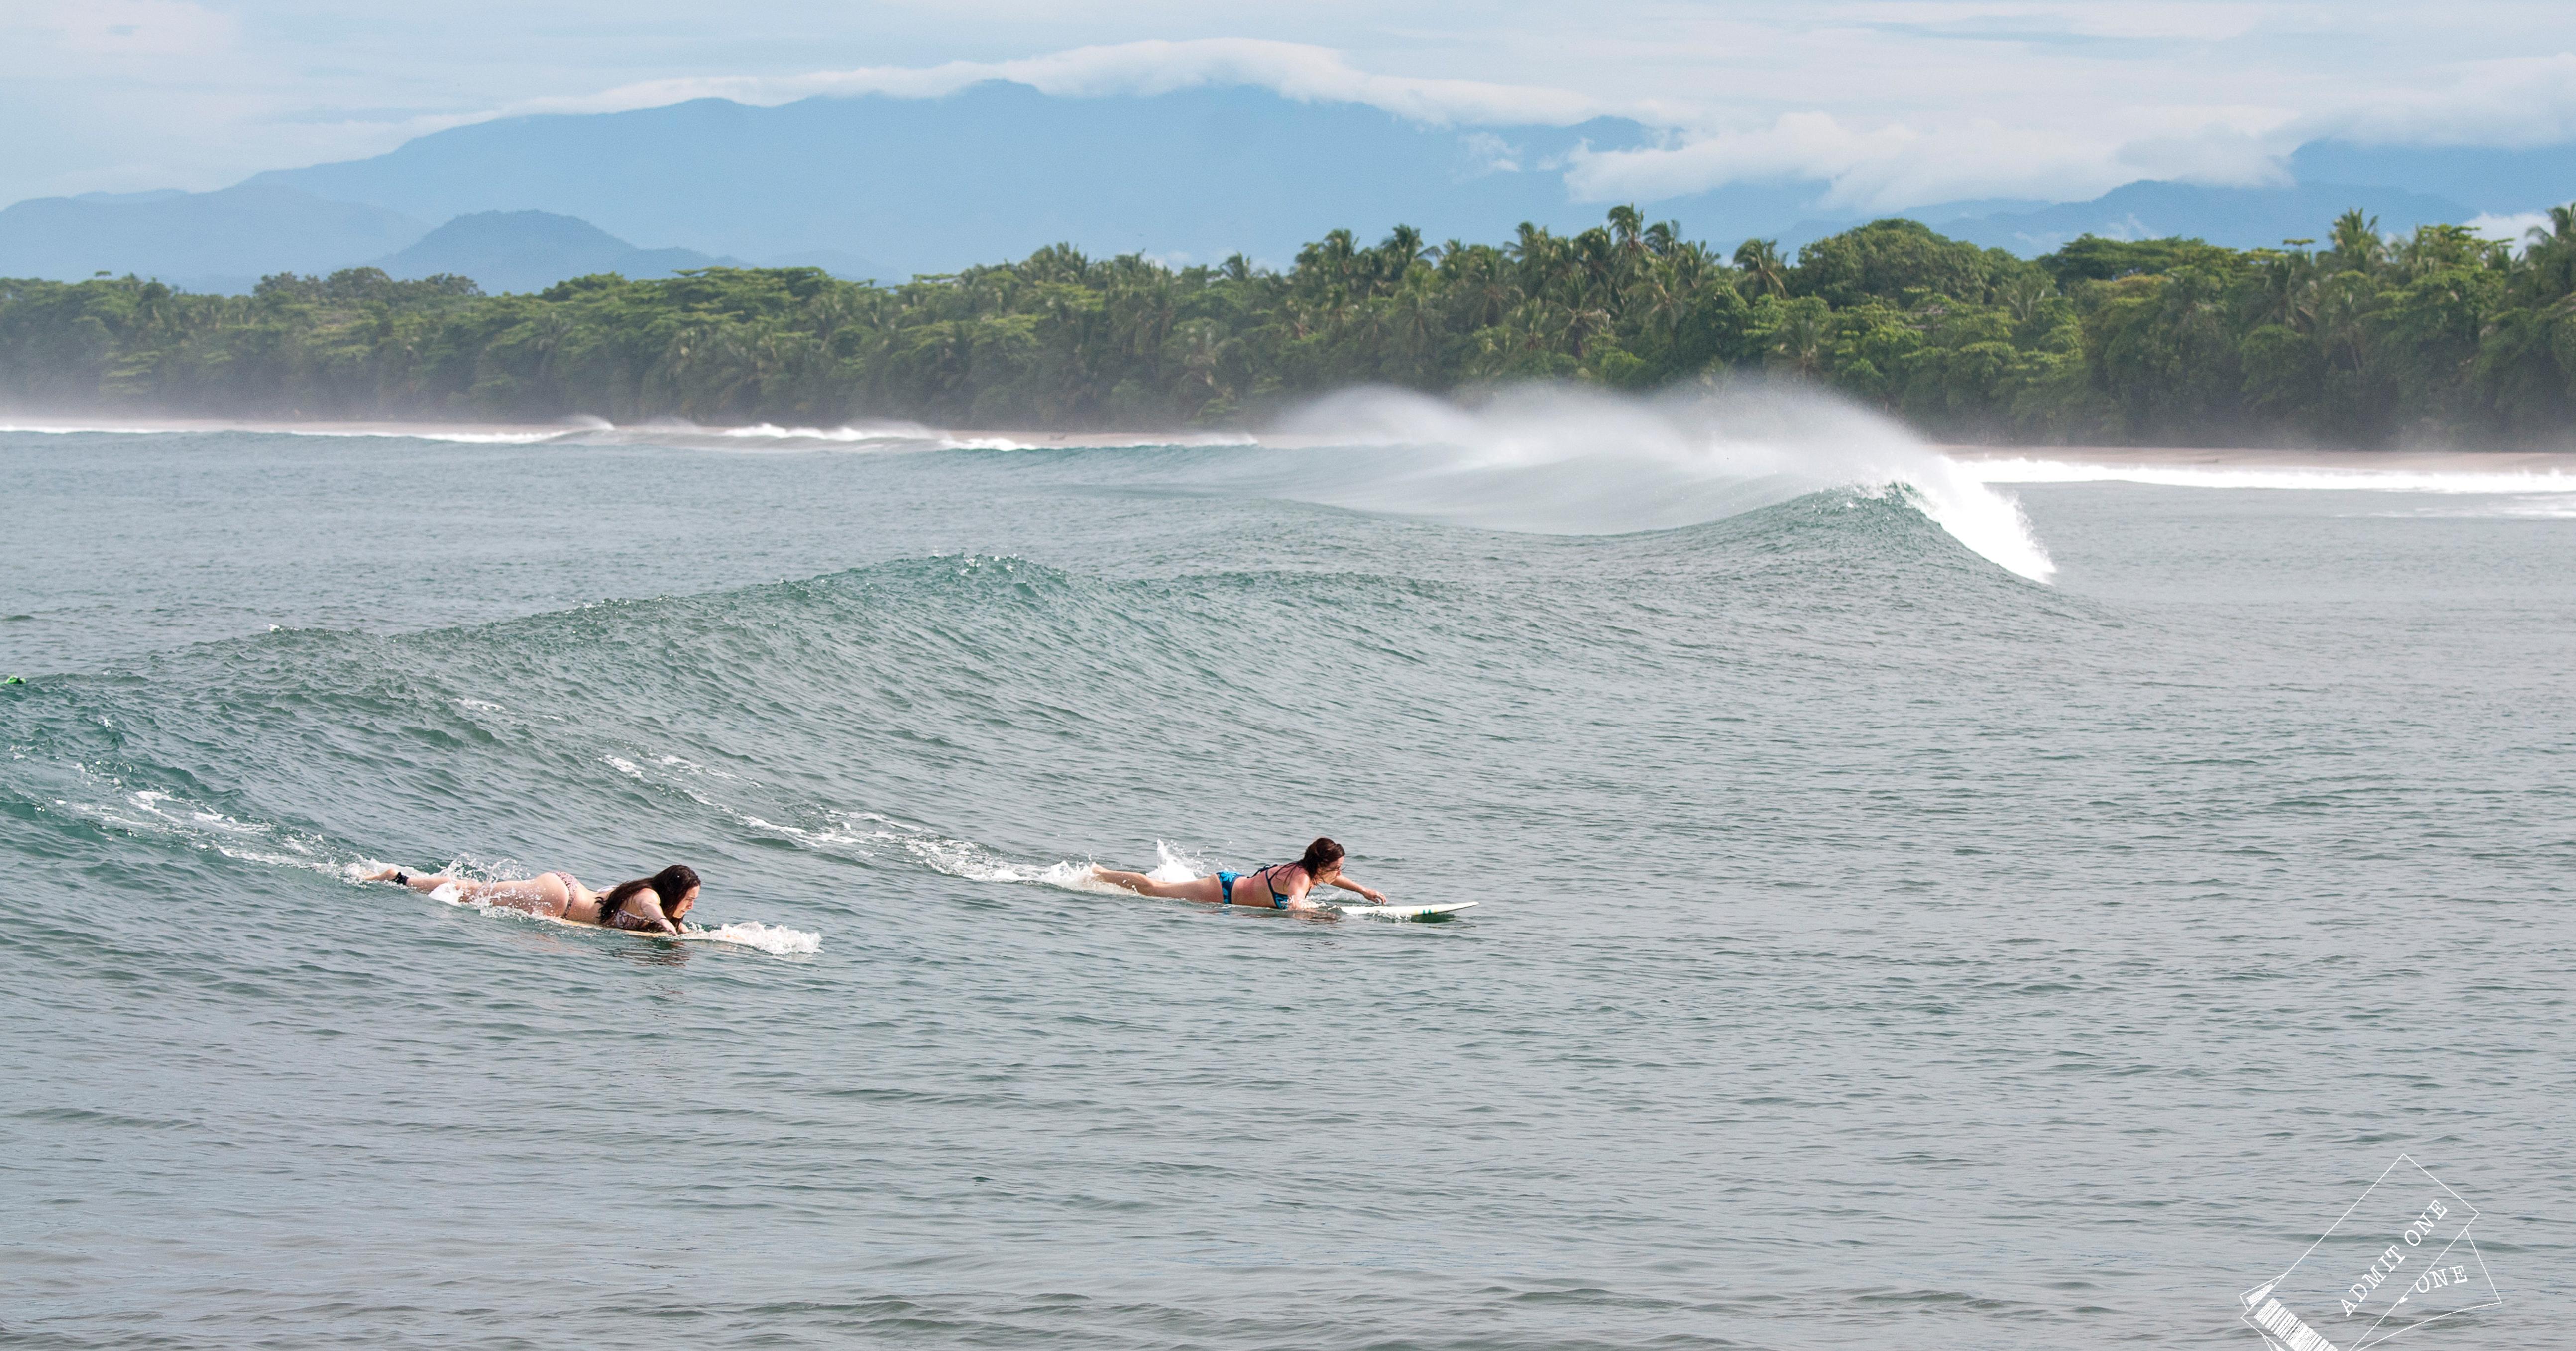 Start off with some surf at Elijah's